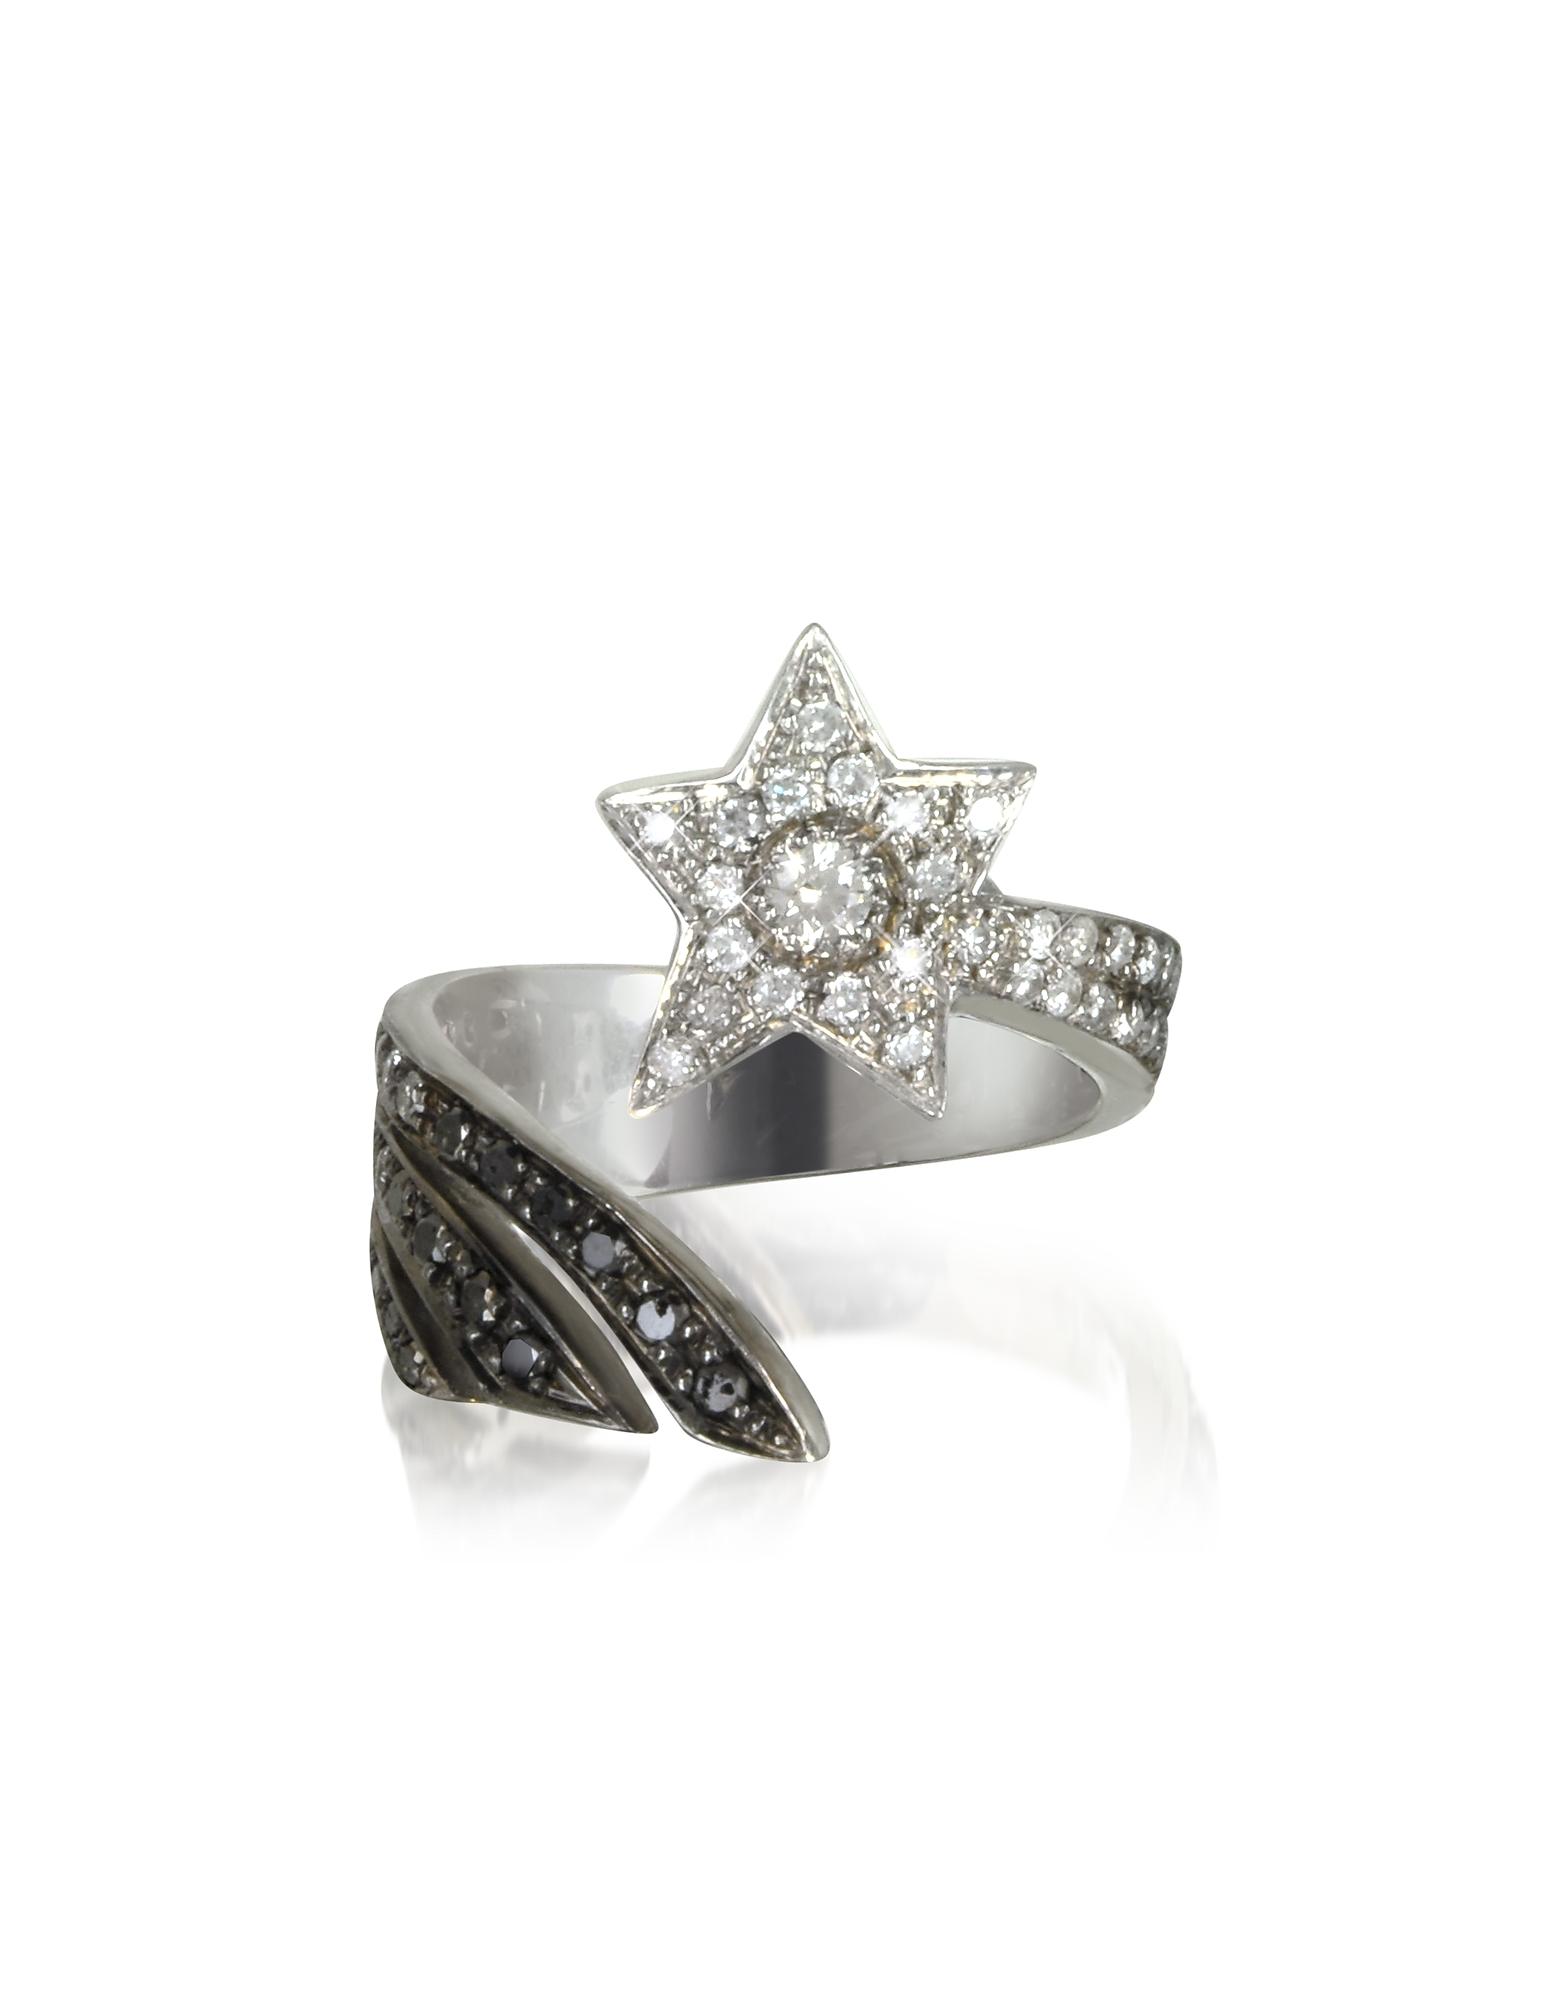 Bernard Delettrez Rings, Shooting Star 18K White Gold Midi Ring w/White, Grey and Black Diamonds